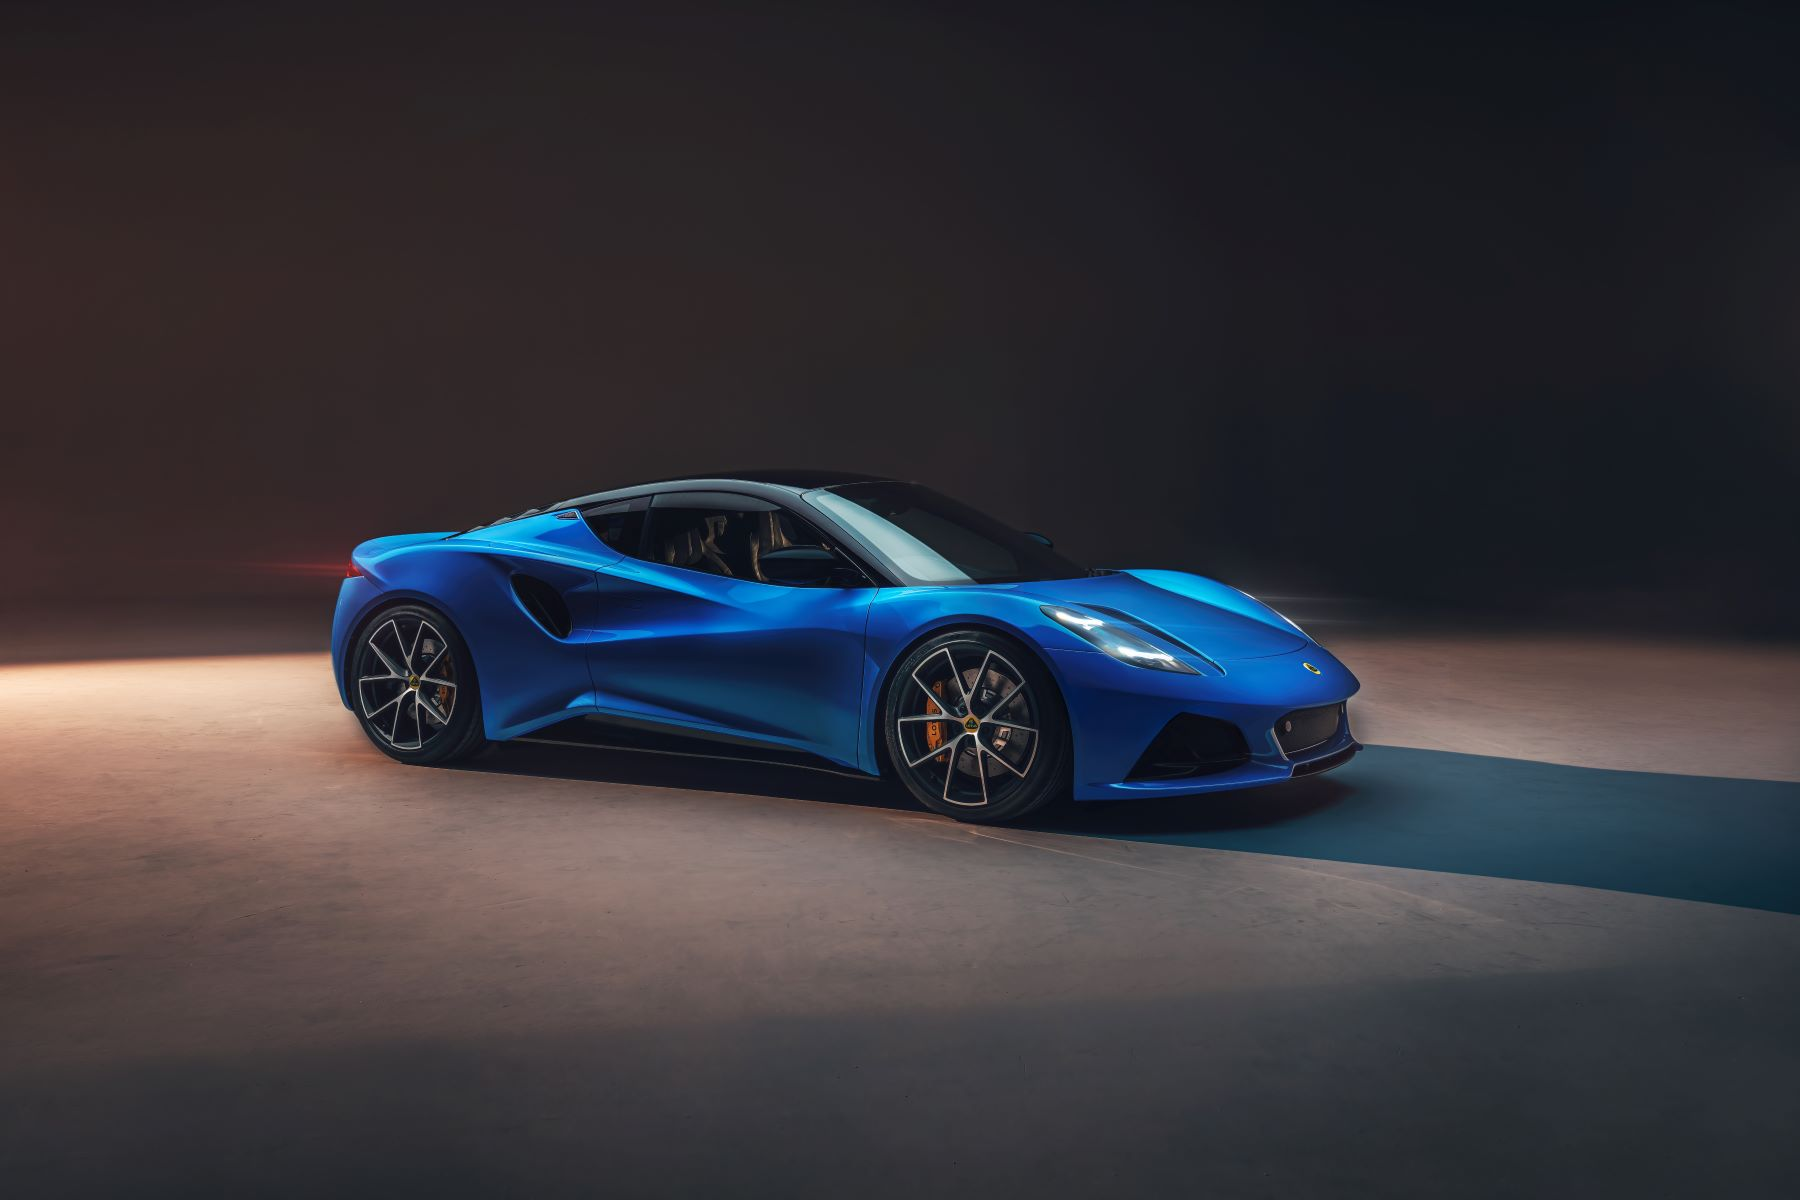 The Lotus Emira luxury sports car in blue